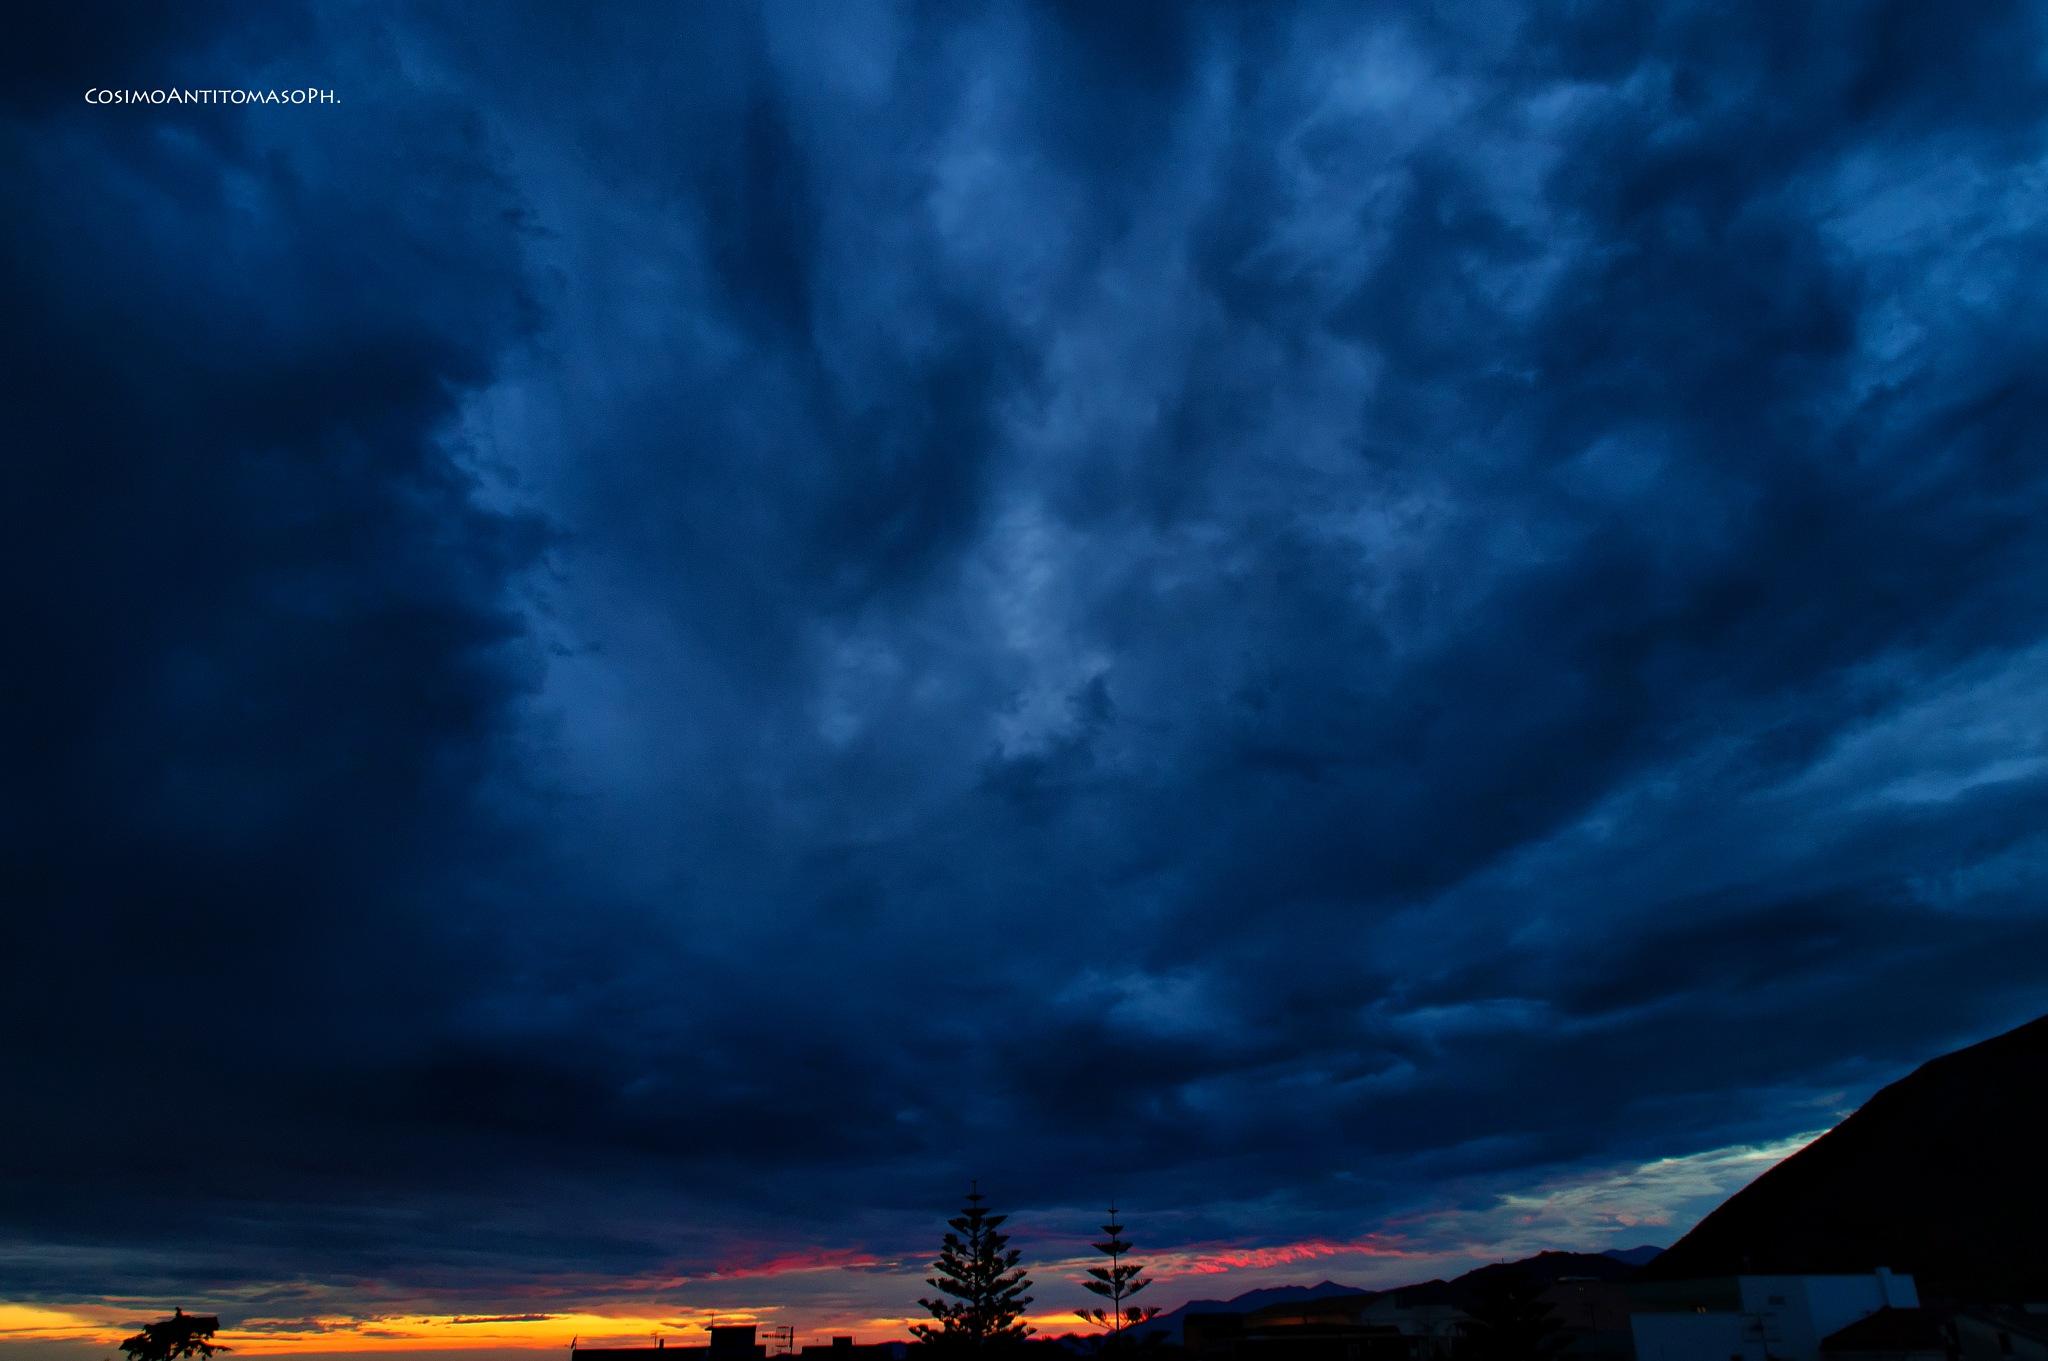 Un cielo speciale by Cosimo Antitomaso